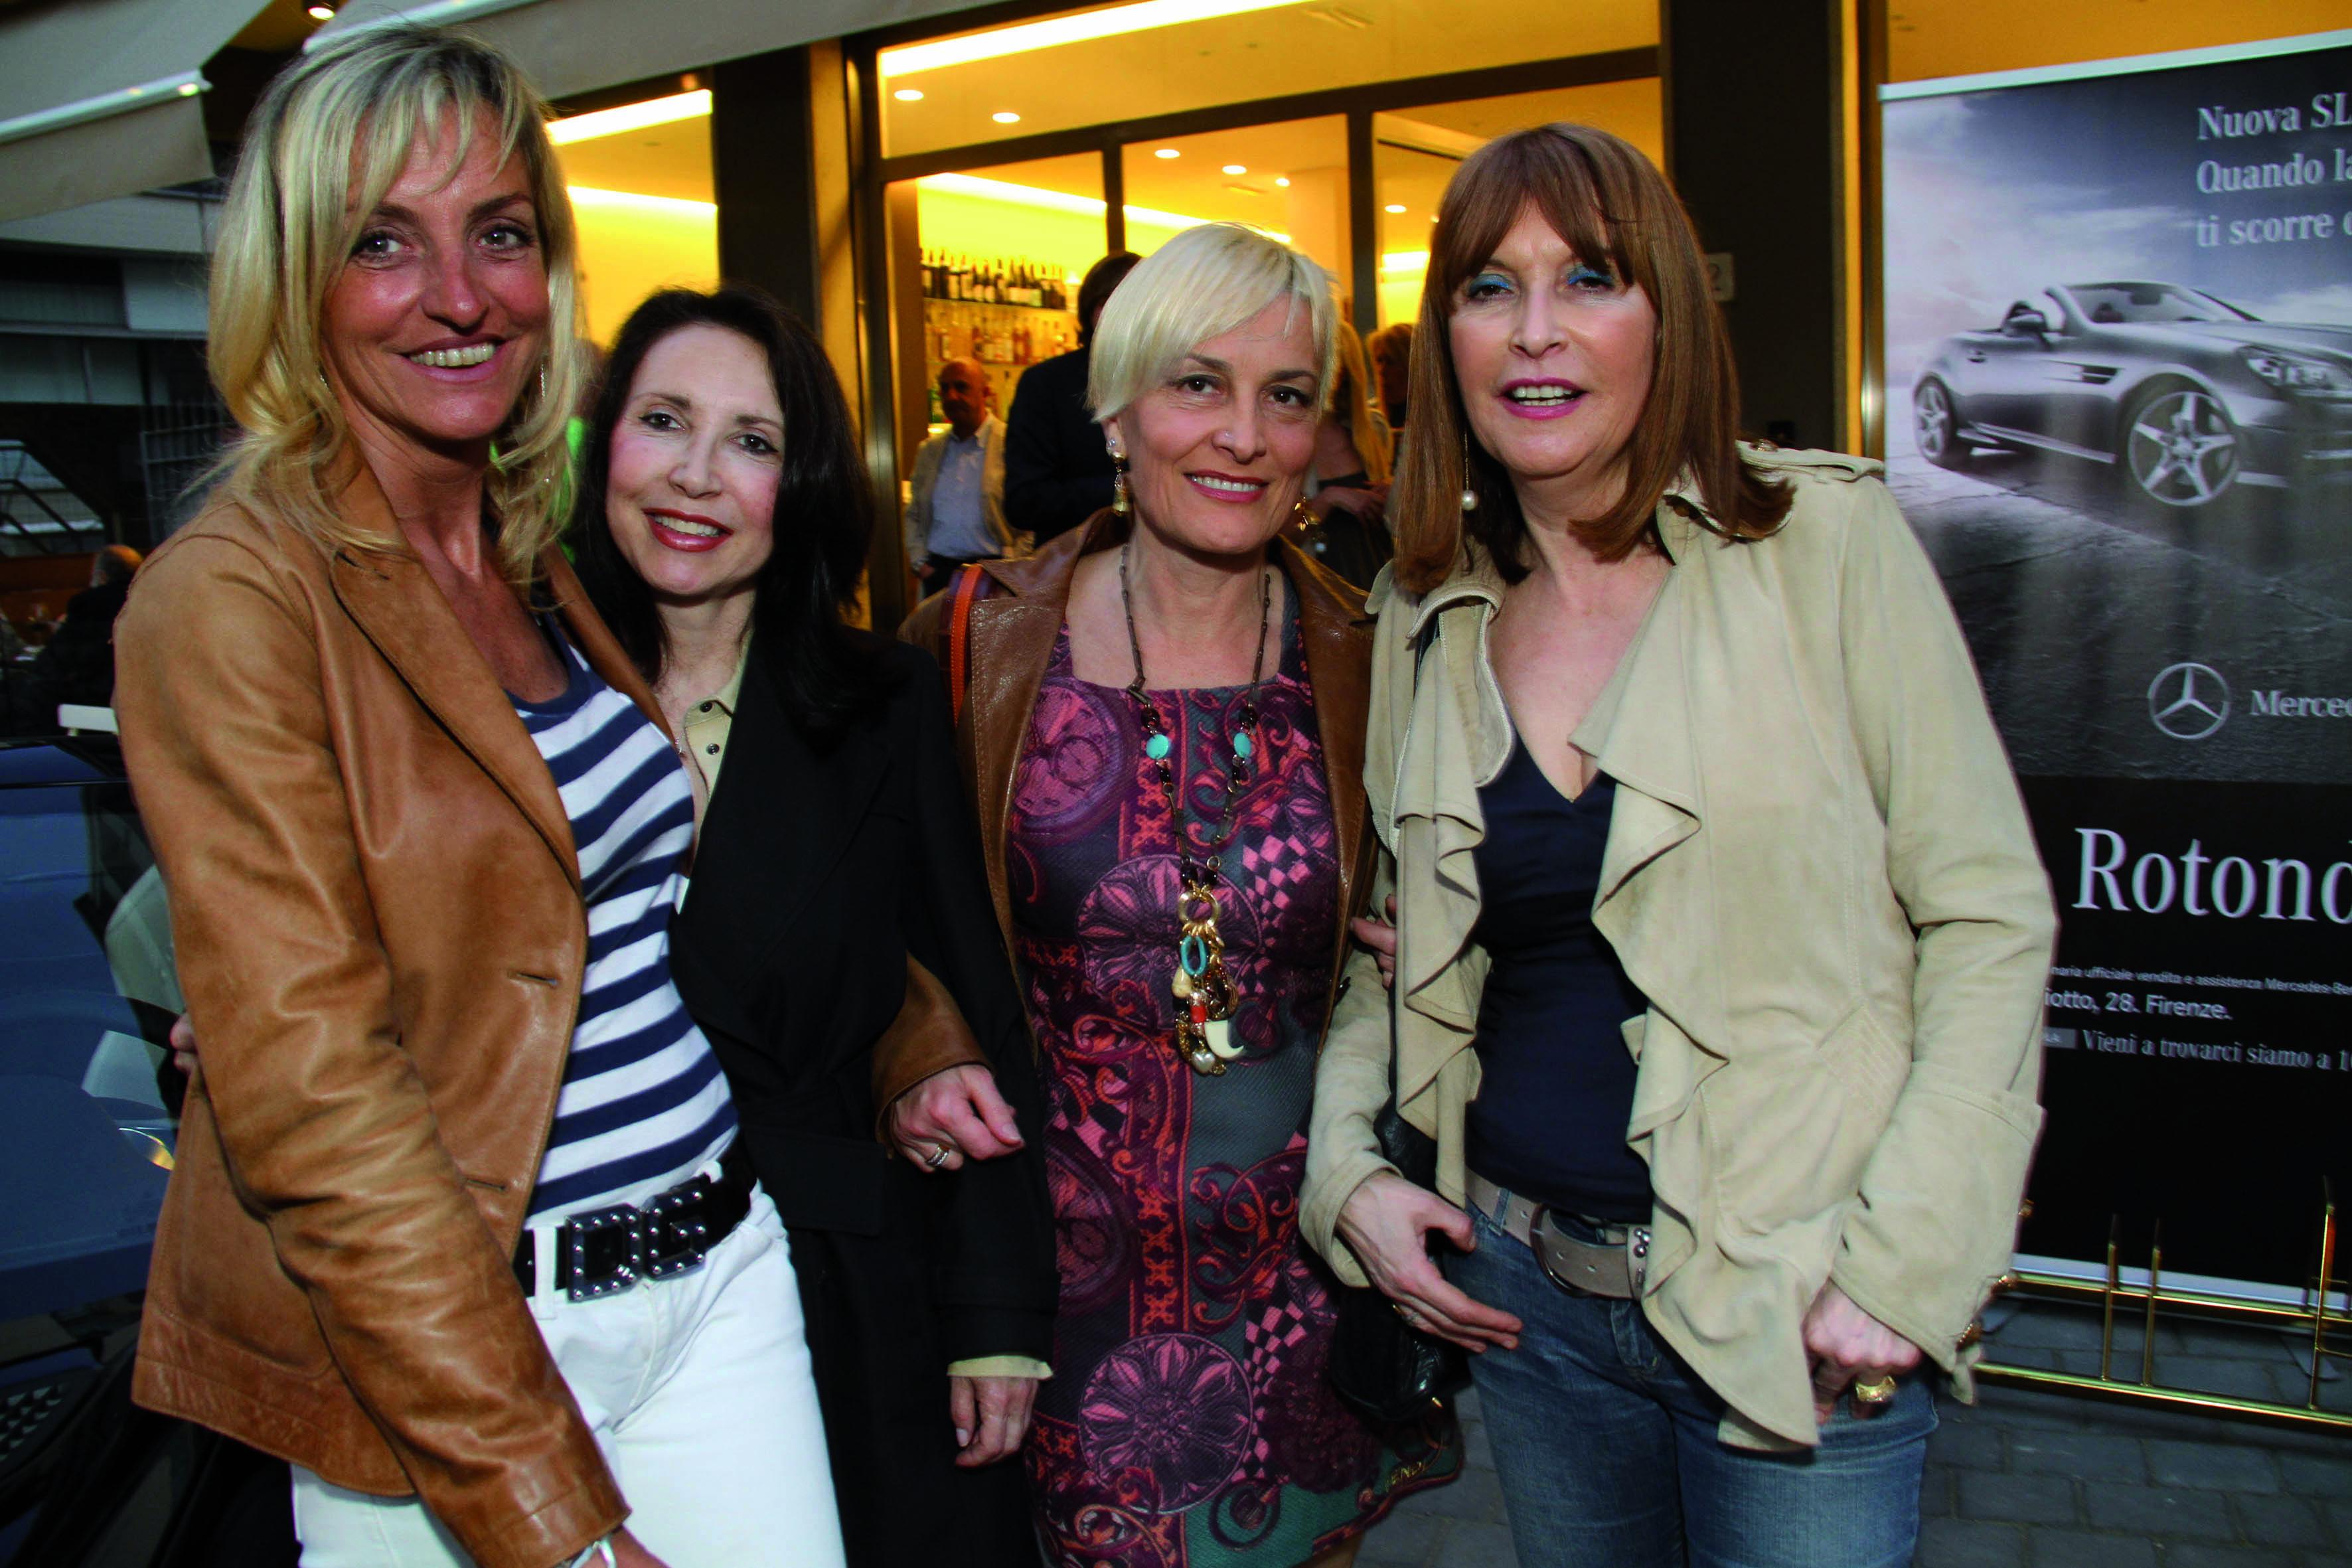 pressphoto,Firenze- Serata Mercedes allo Stad ,Firenze Magazine-nella foto :Barbara Vergelli, Simonetta d'Ettorre, Monica Berti, Stefania Boni